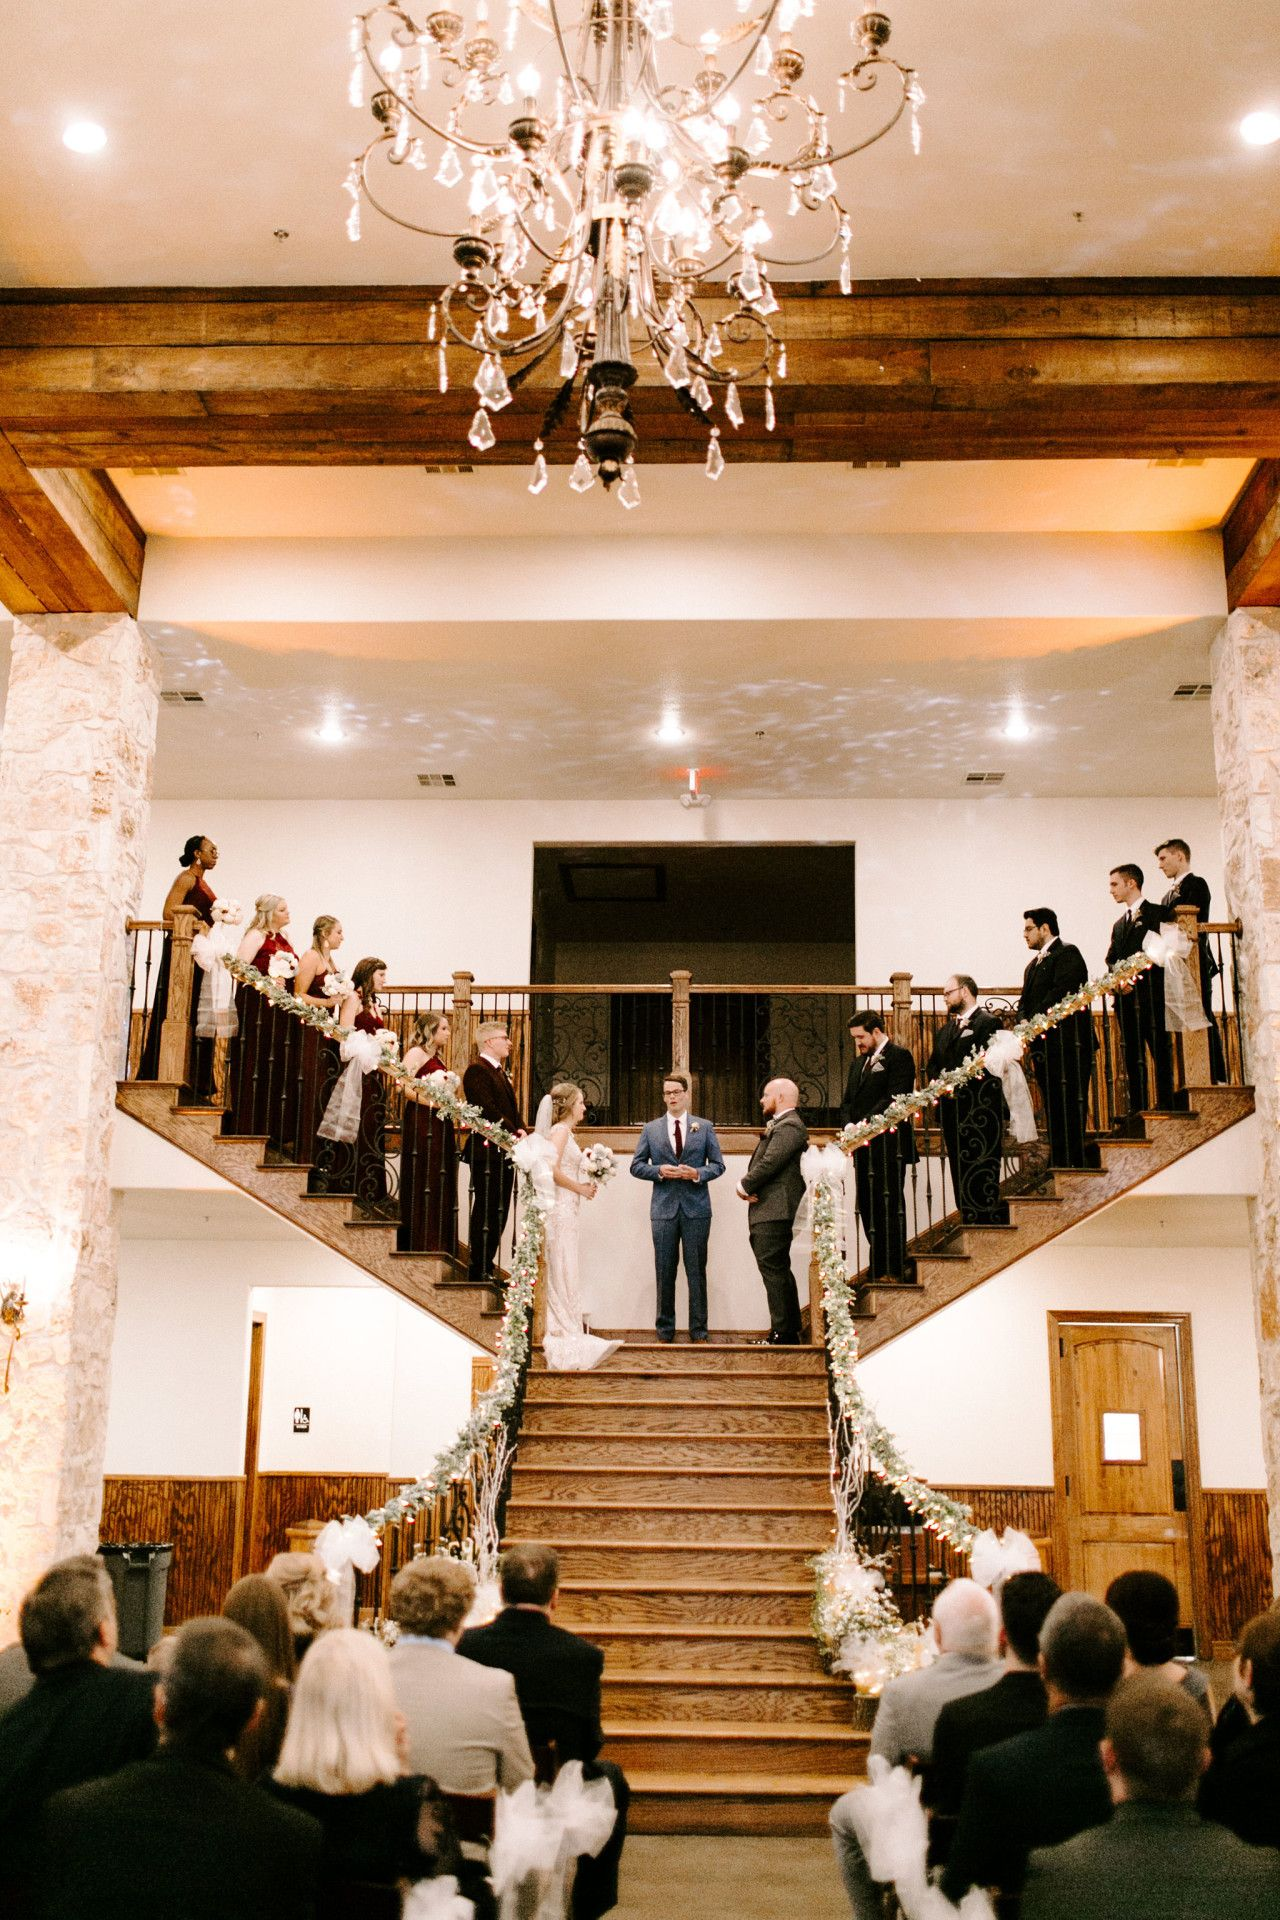 Tuscany Hill Wedding Ceremony Reception Hall In 2020 Wedding